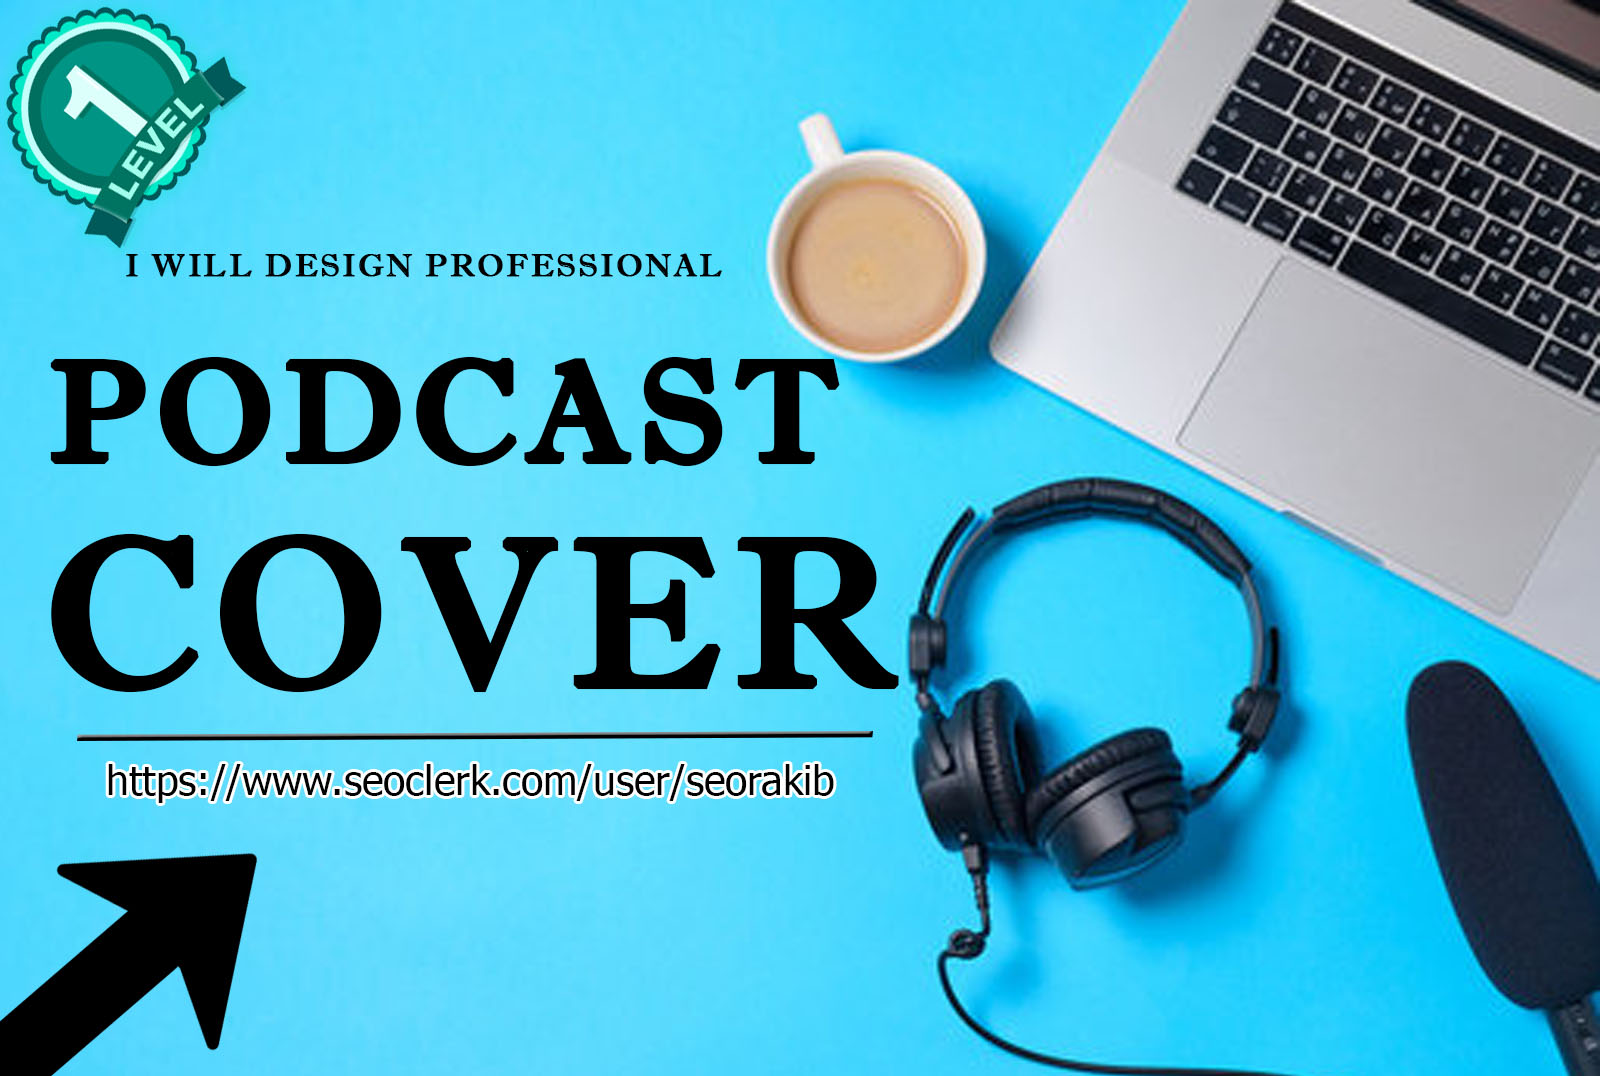 I will do professional podcast cover art design